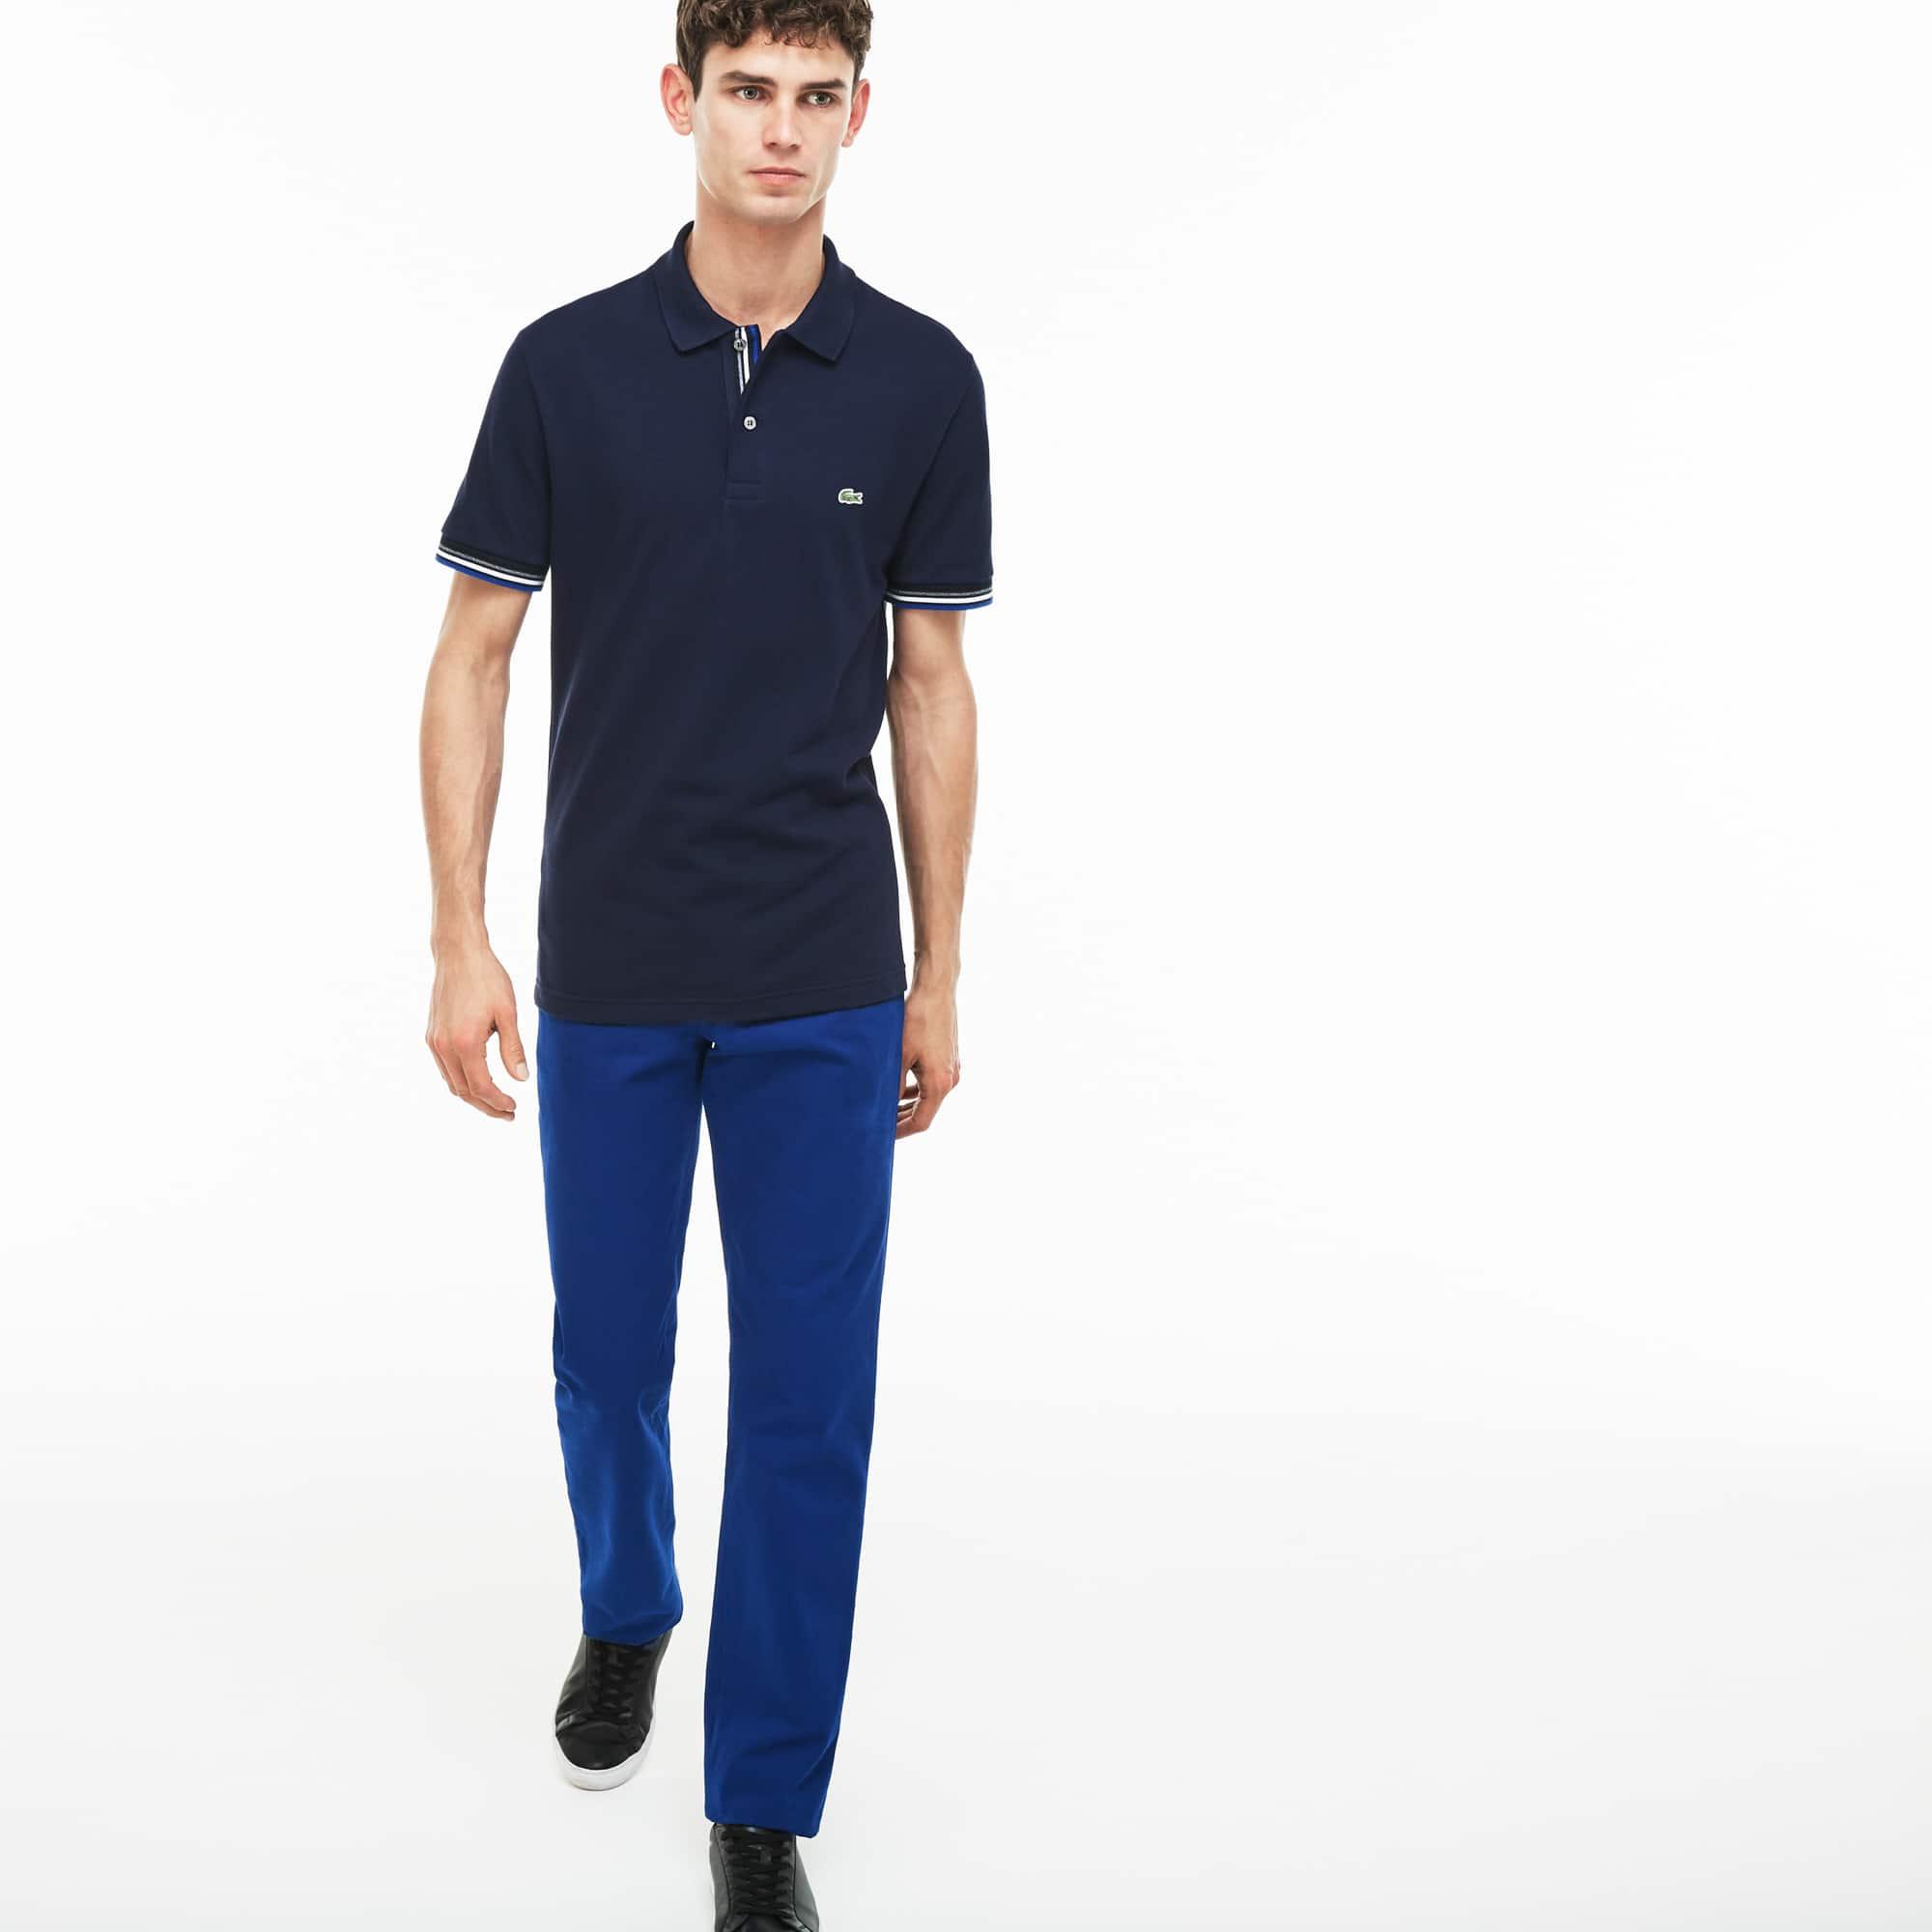 256cec6fb2 Men'S Regular Fit Cotton Gabardine Chino Pants in Navy Blue